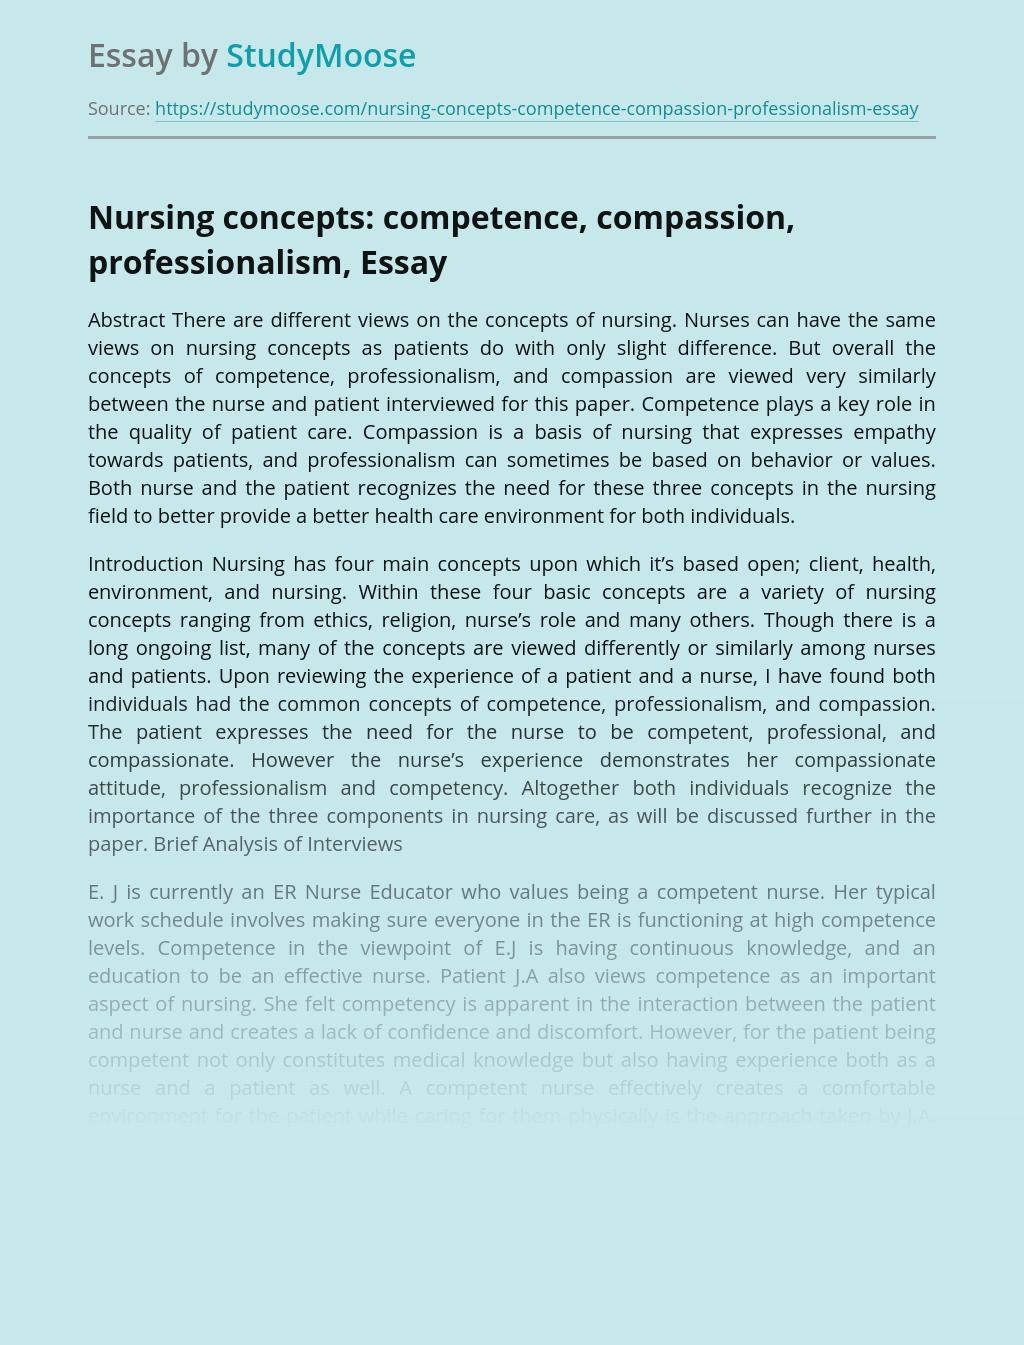 Nursing concepts: competence, compassion, professionalism,